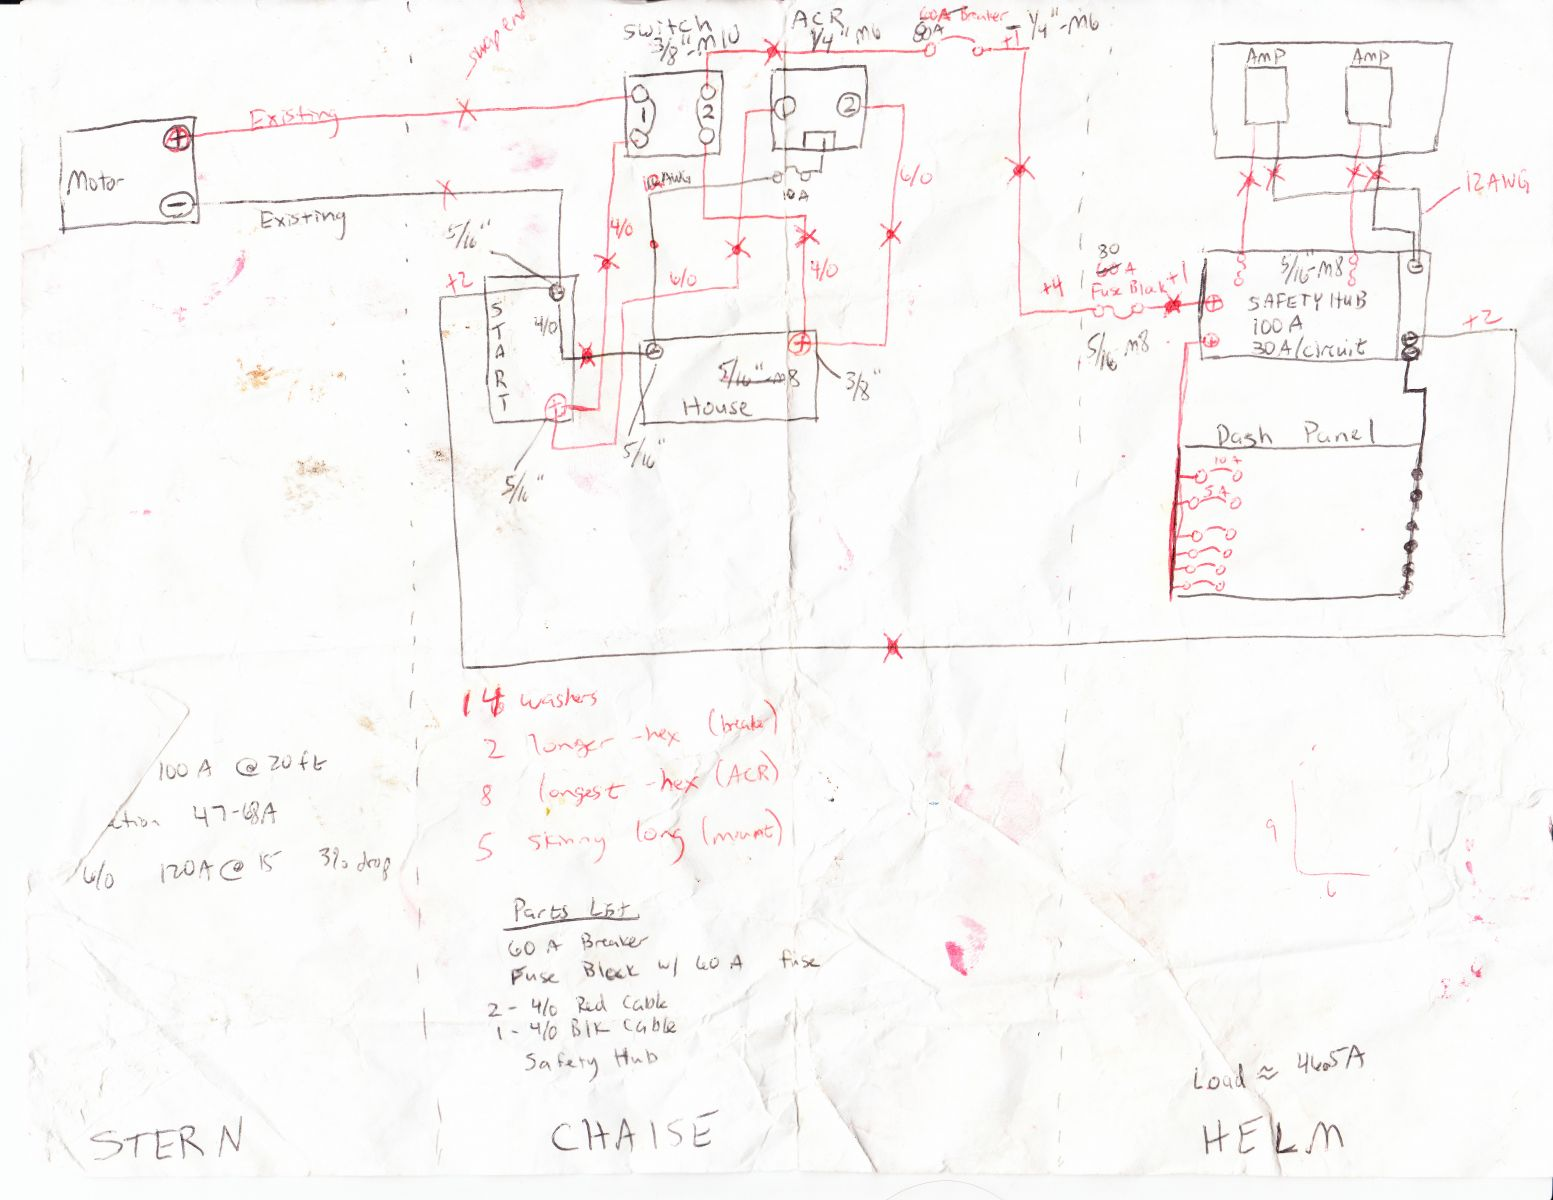 Wiring Diagram of Blue Seas mini-add-a-battery install